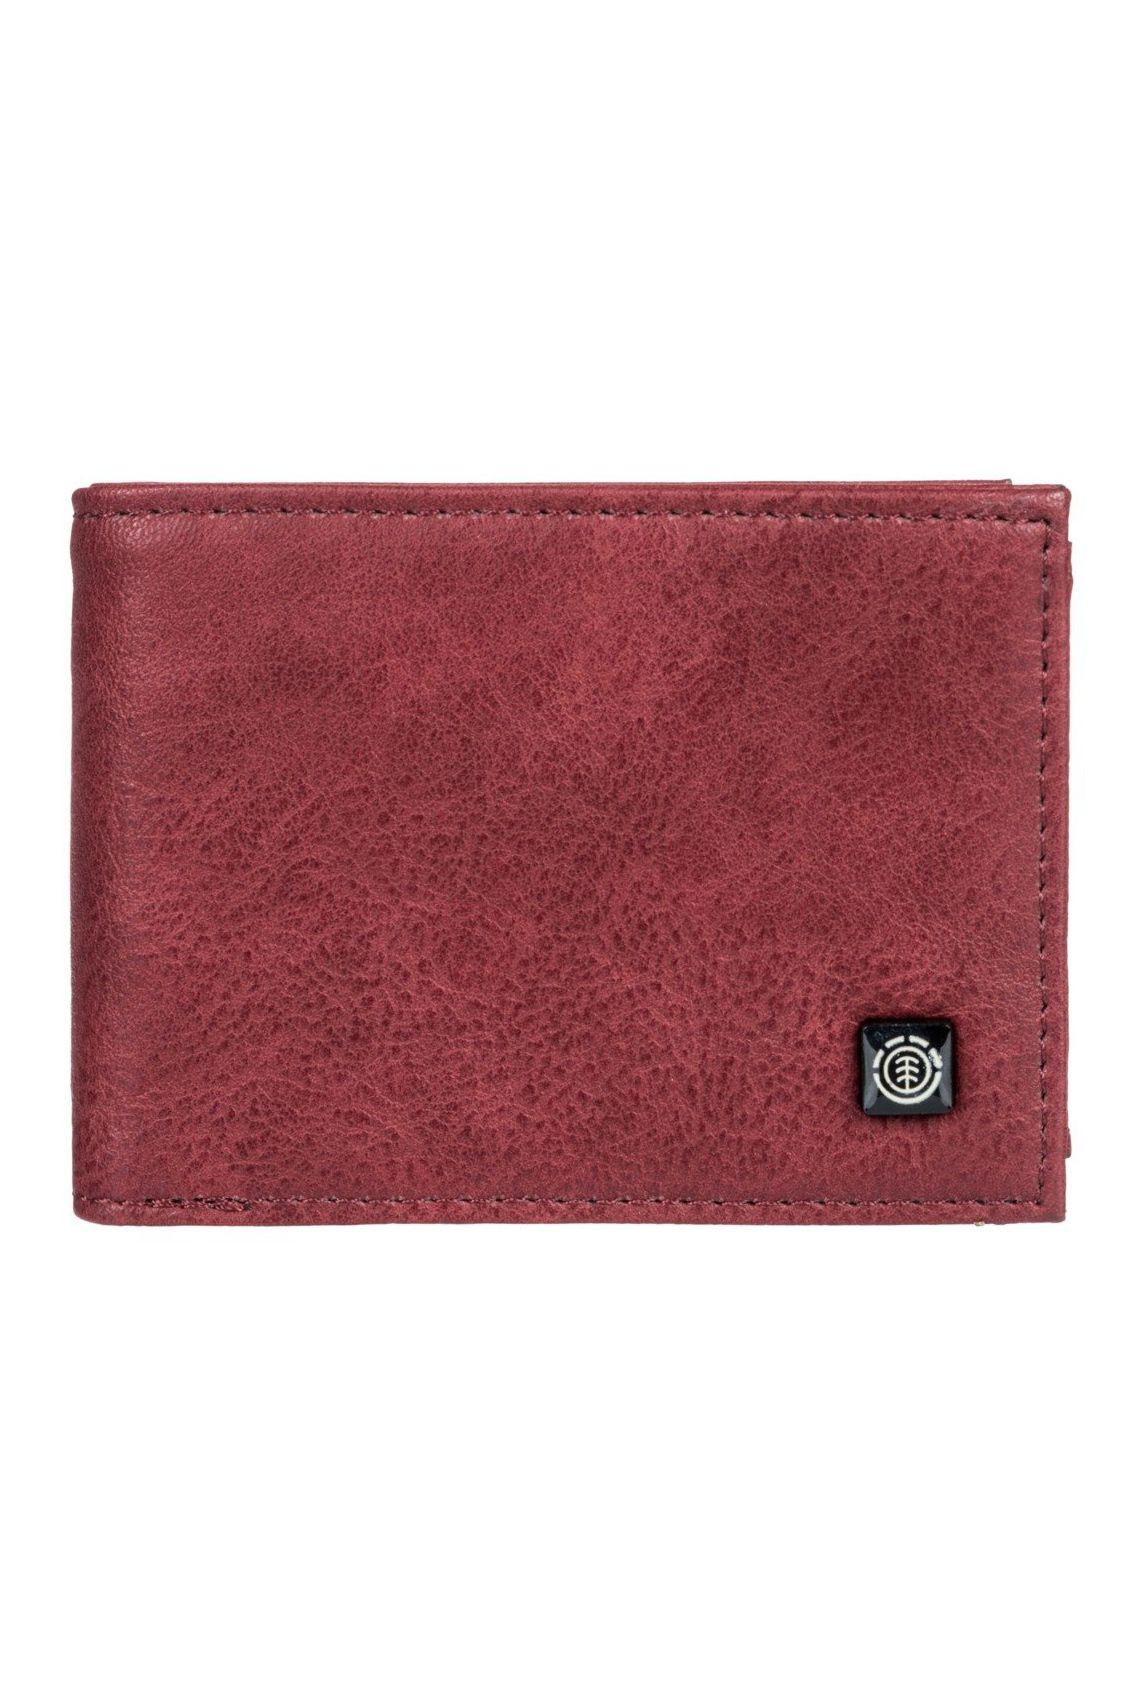 Element Wallet PU  SEGUR WALLET Vintage Red